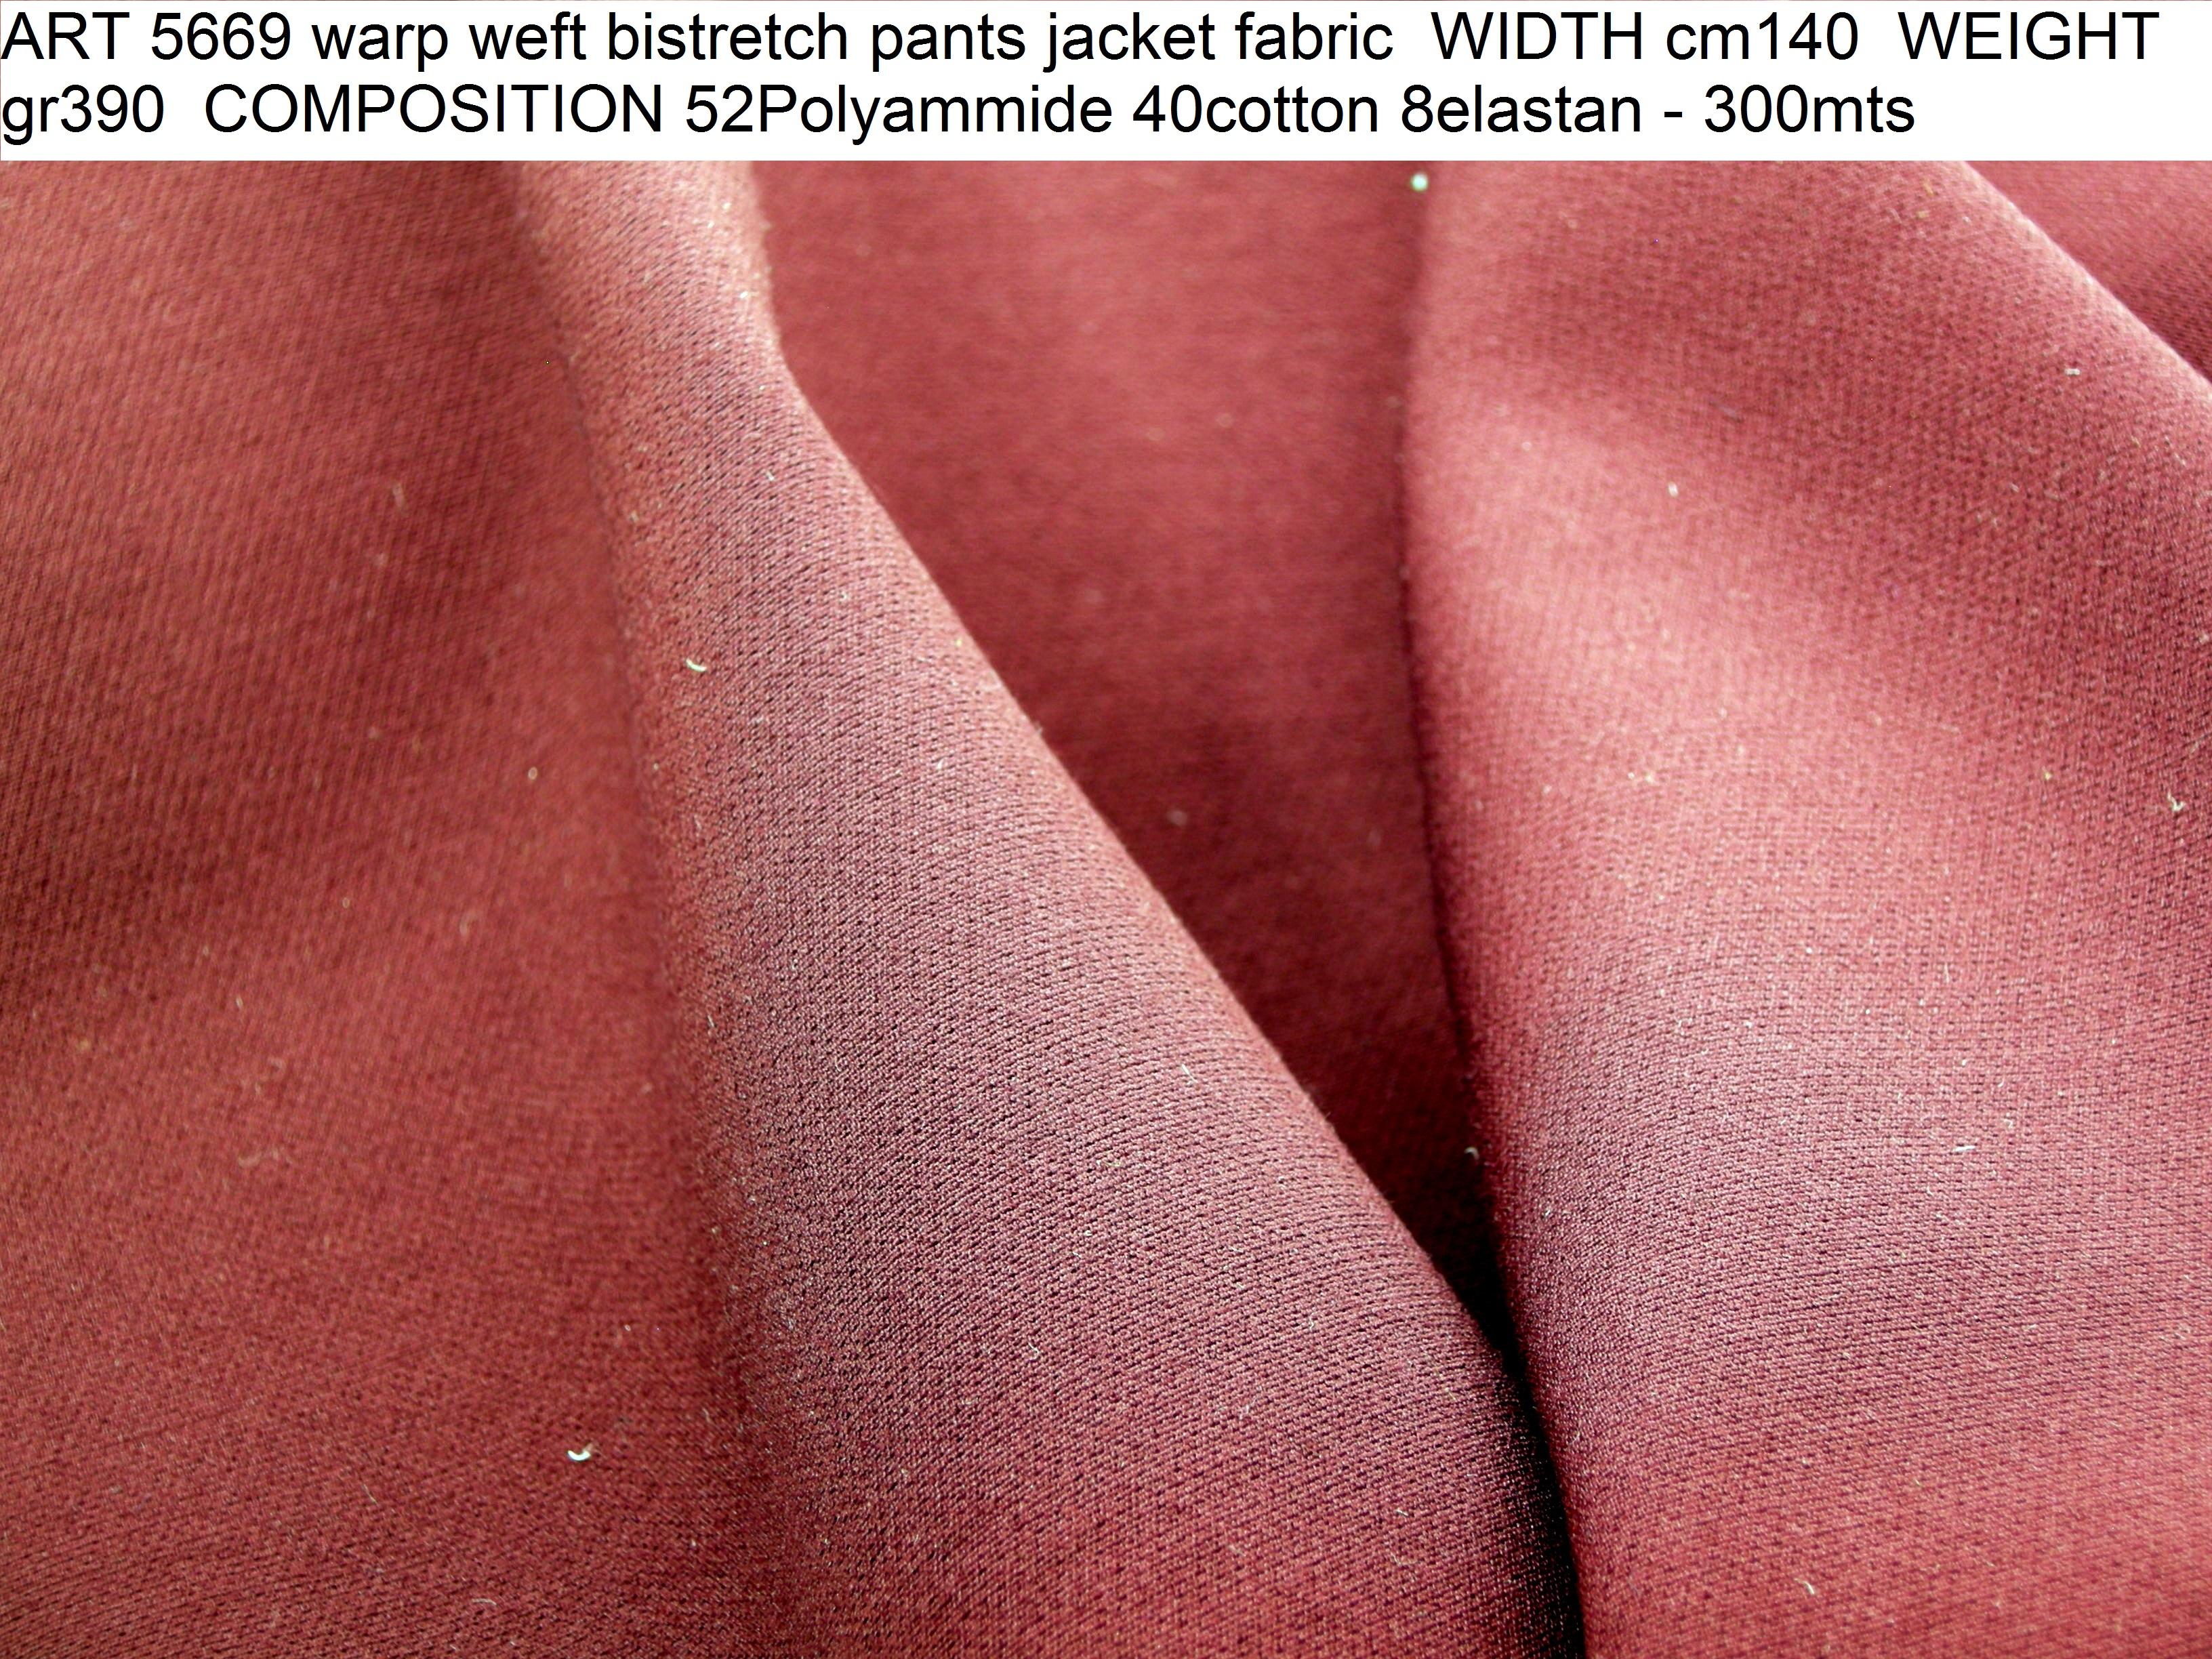 ART 5669 warp weft bistretch pants jacket fabric WIDTH cm140 WEIGHT gr390 COMPOSITION 52Polyammide 40cotton 8elastan - 300mts